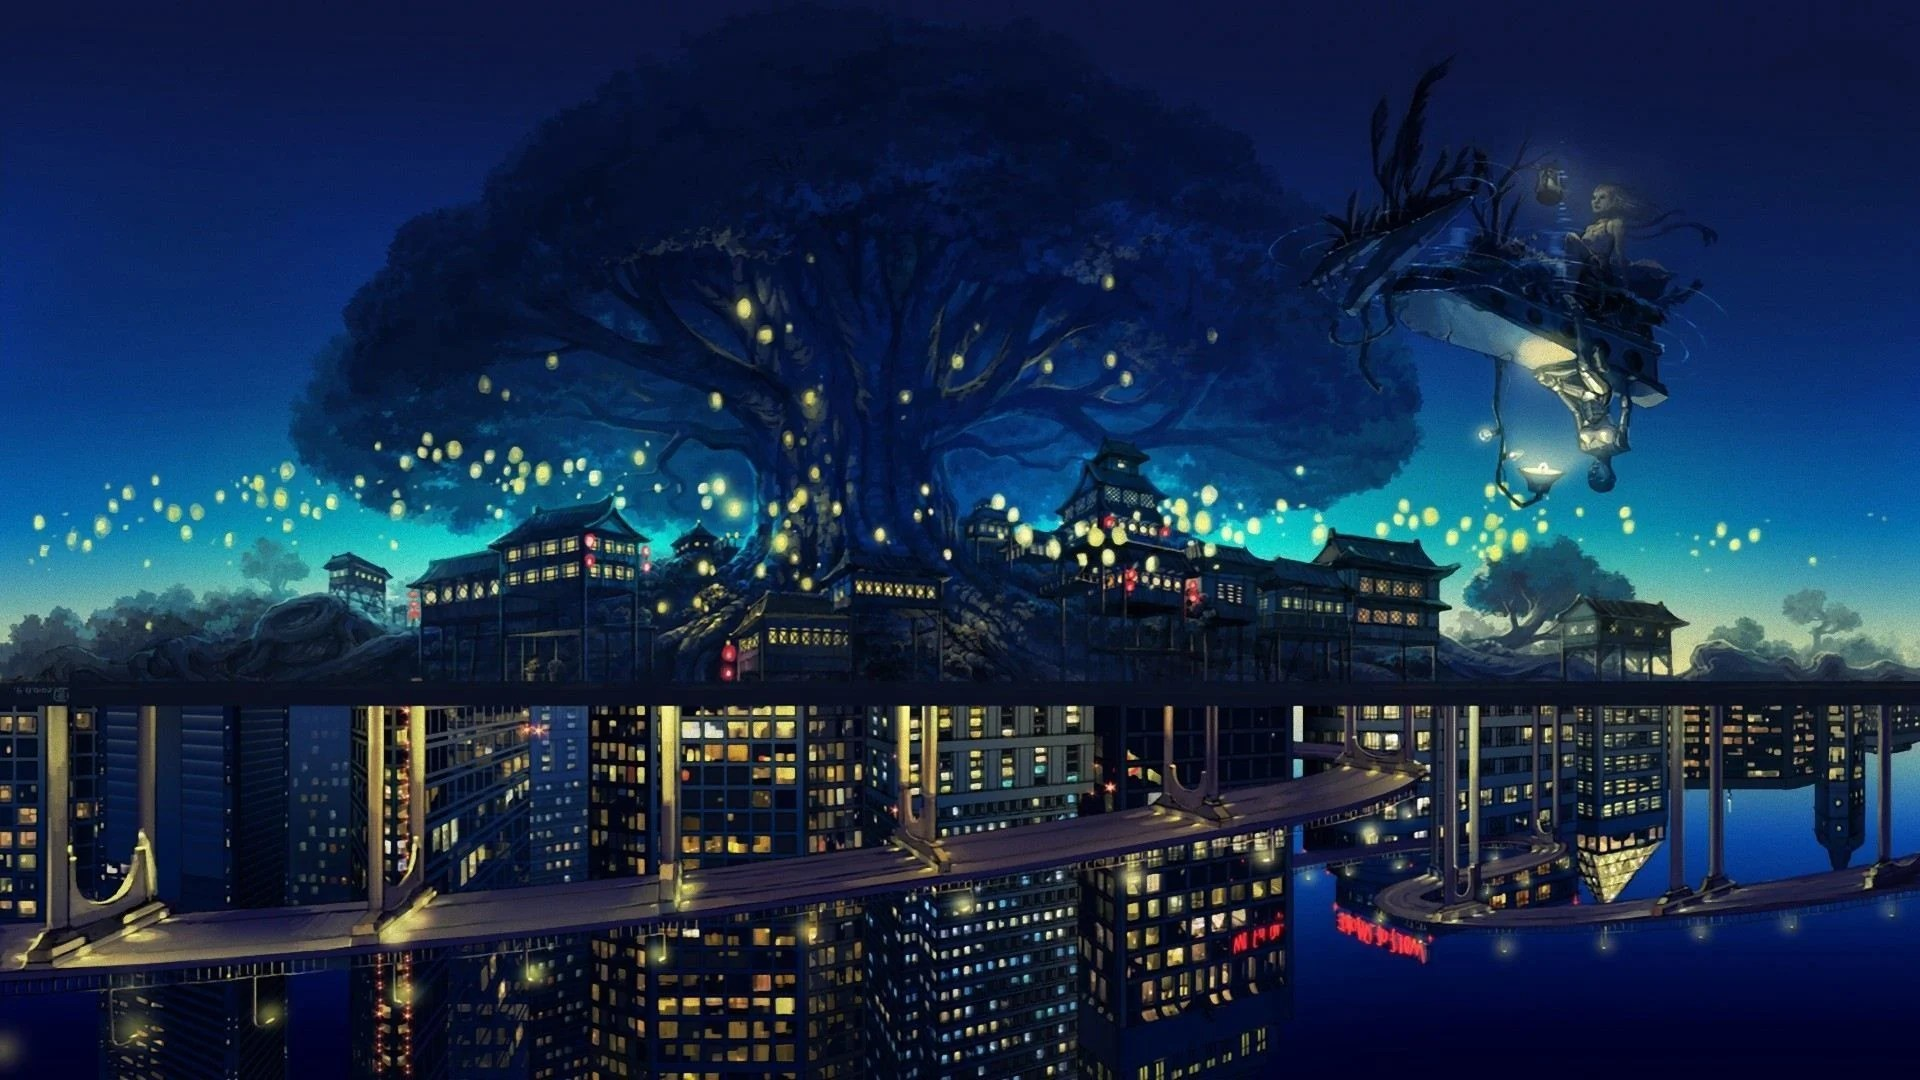 Anime scenery wallpaper desktop background is cool wallpapers. Anime Aesthetic Night Wallpapers - Wallpaper Cave